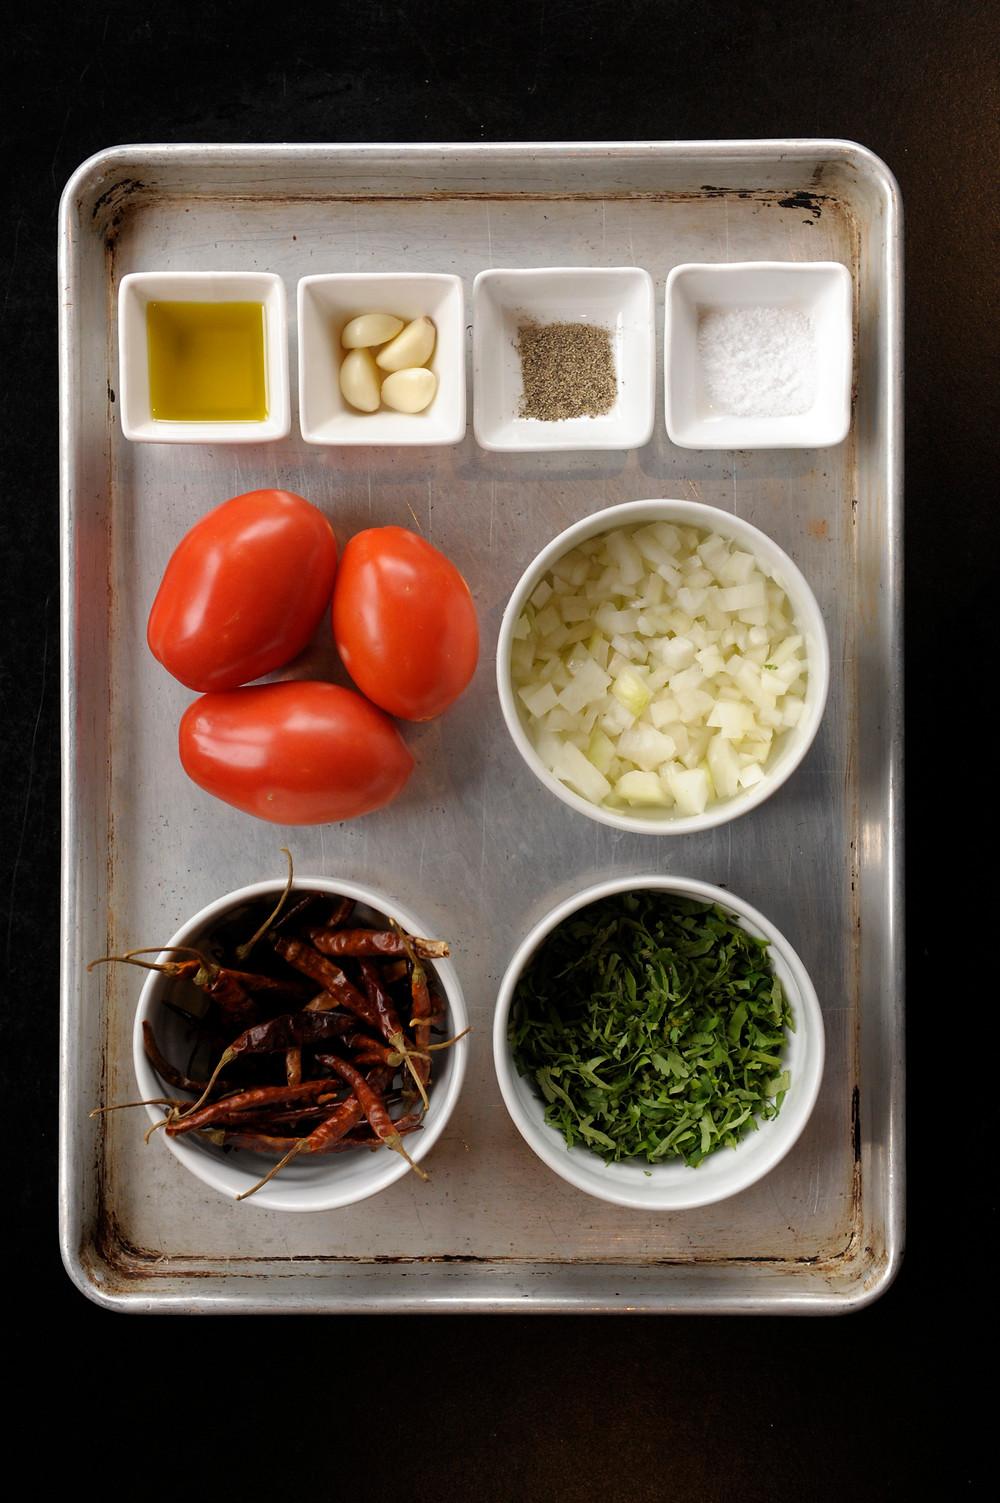 Roasted Tomato-Chile de Arbol Salsa Ingredients